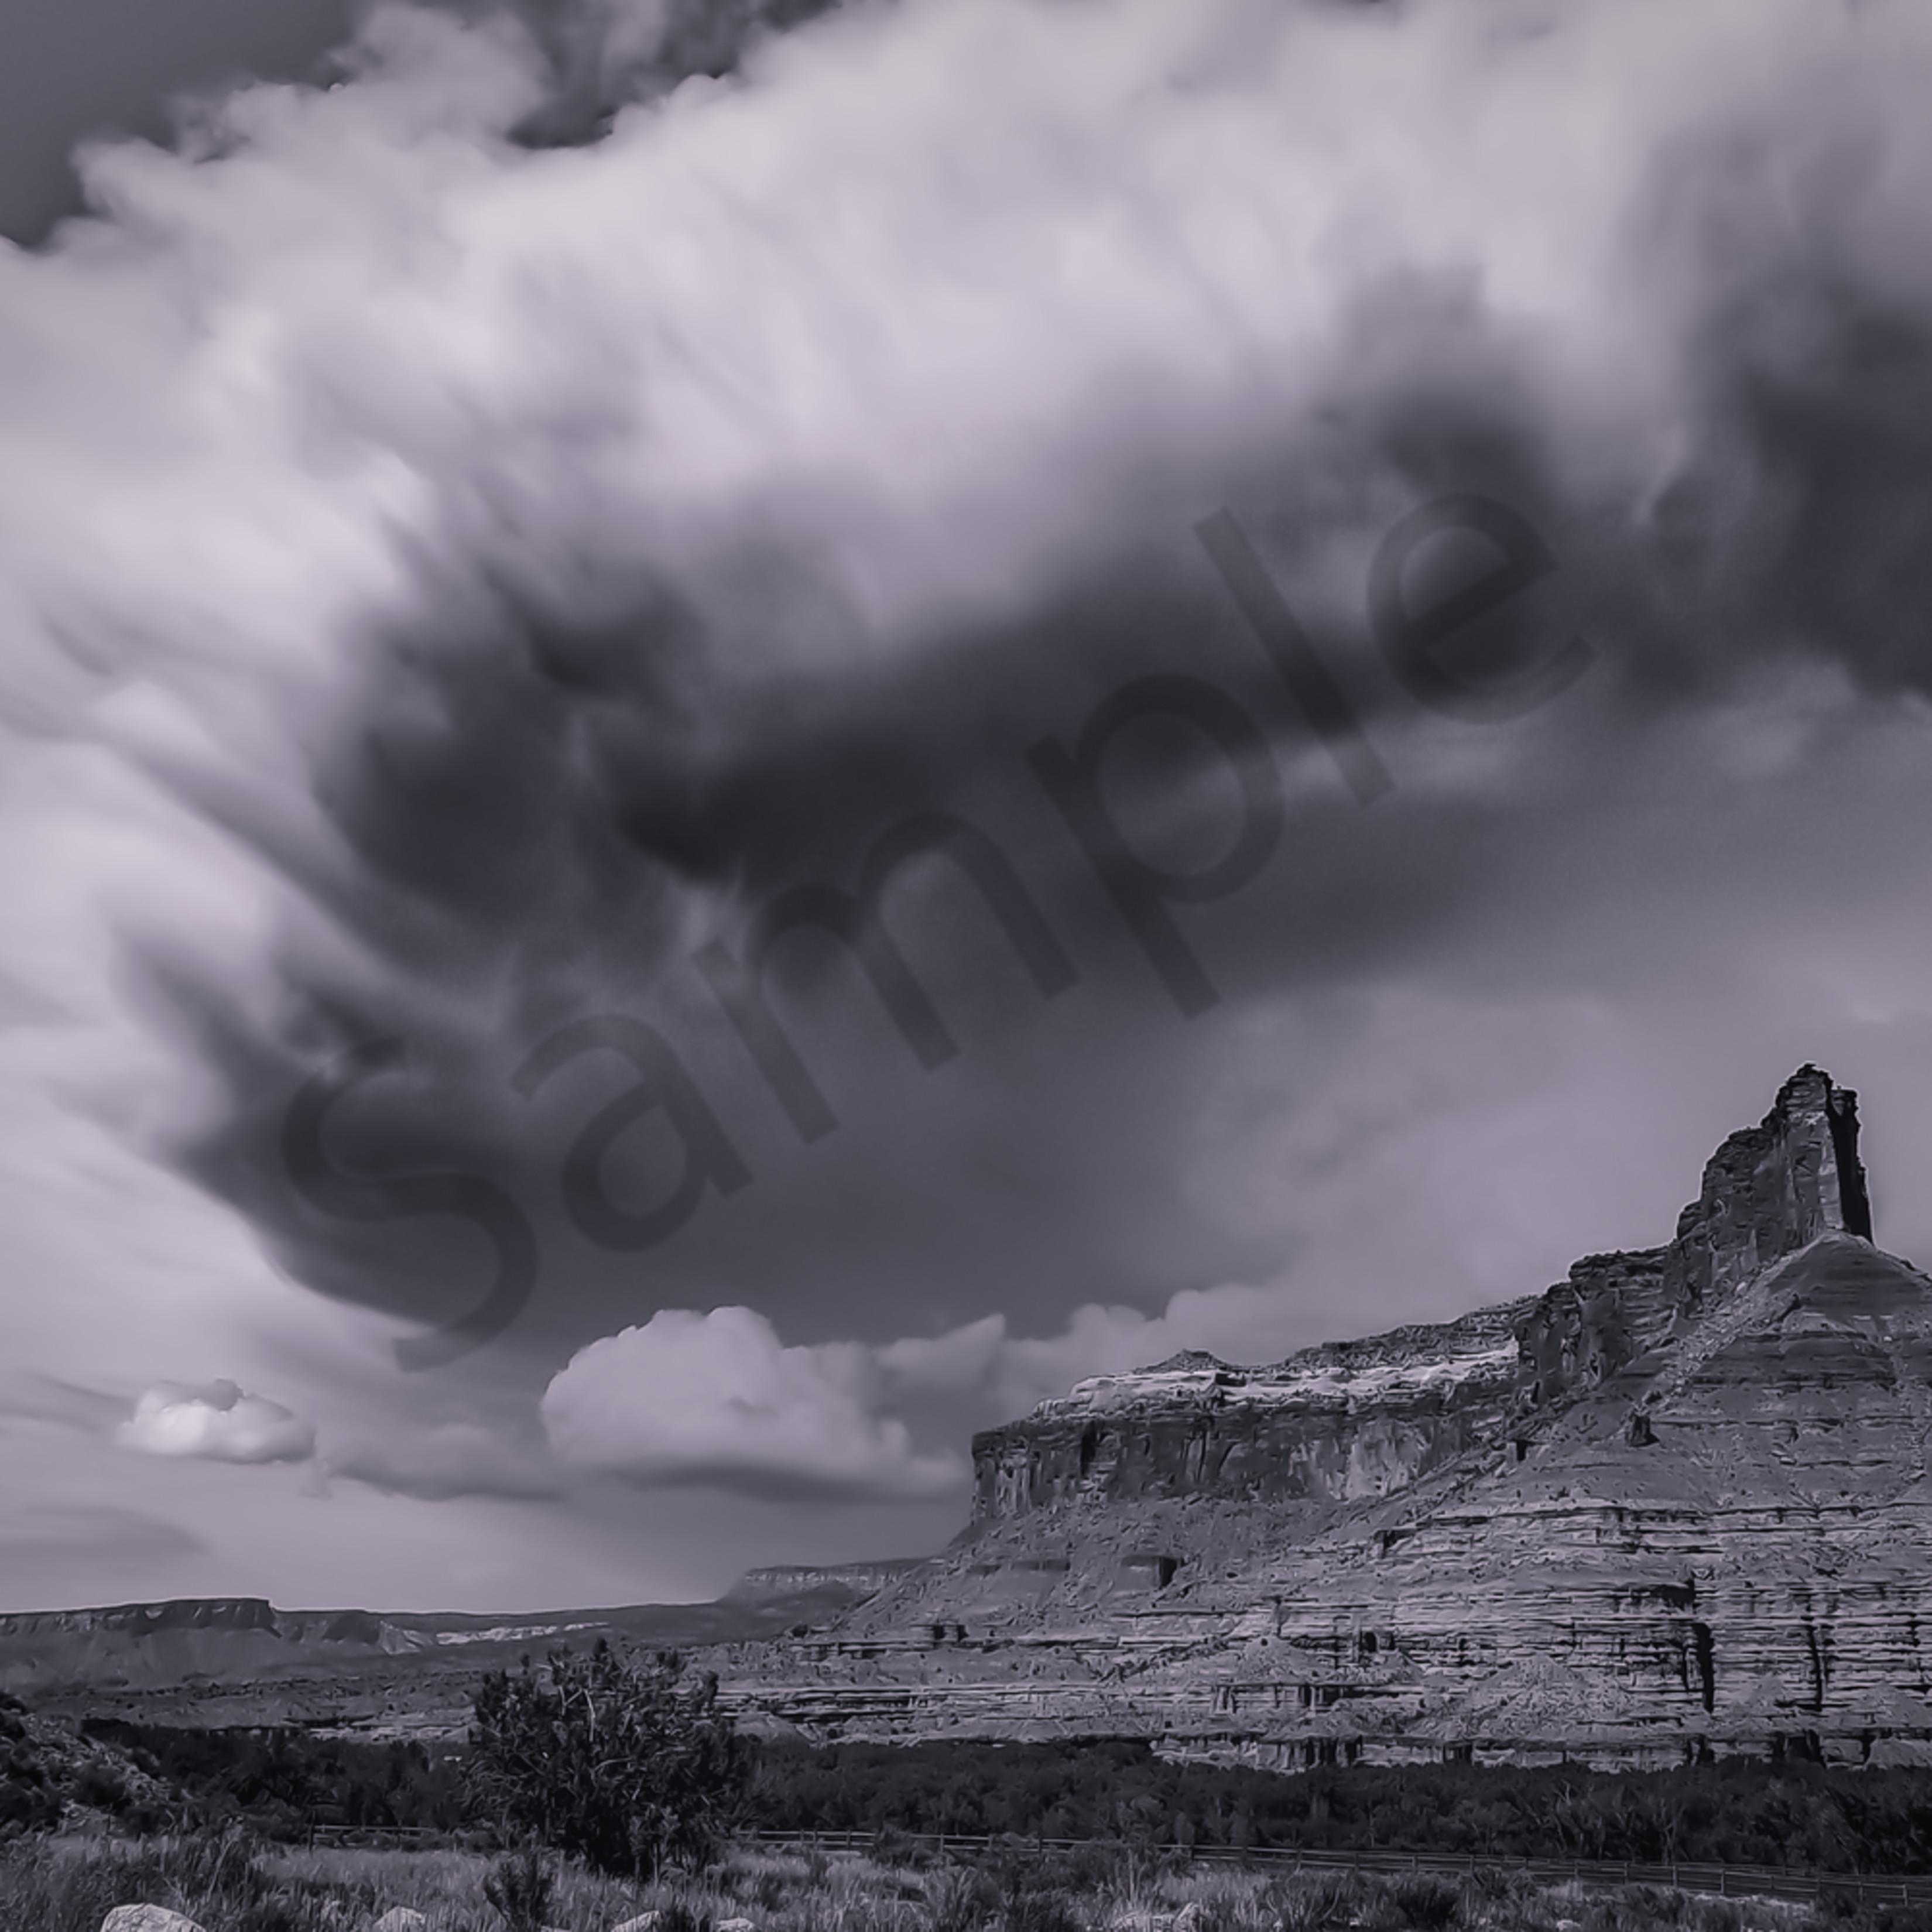 Palisade storm brewing 2 lngo8c